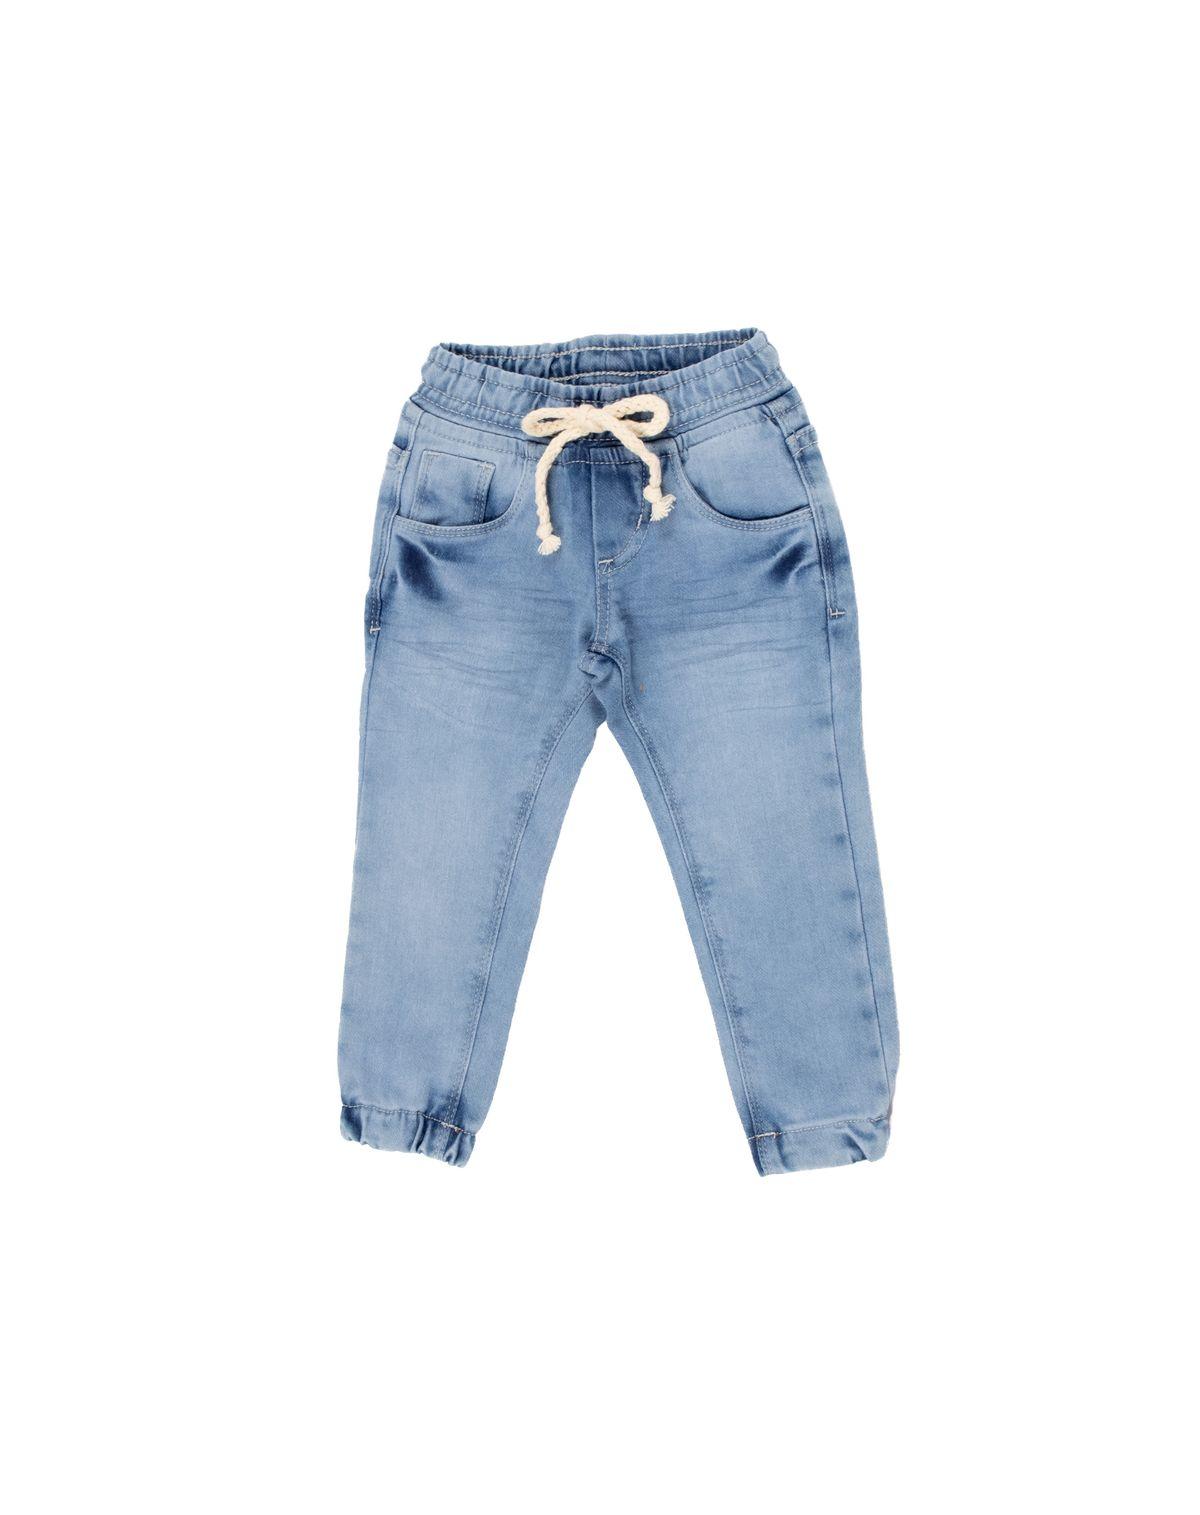 588515002-calca-jeans-azul-claro-jogger-bebe-menina-bolsos-jeans-2-084